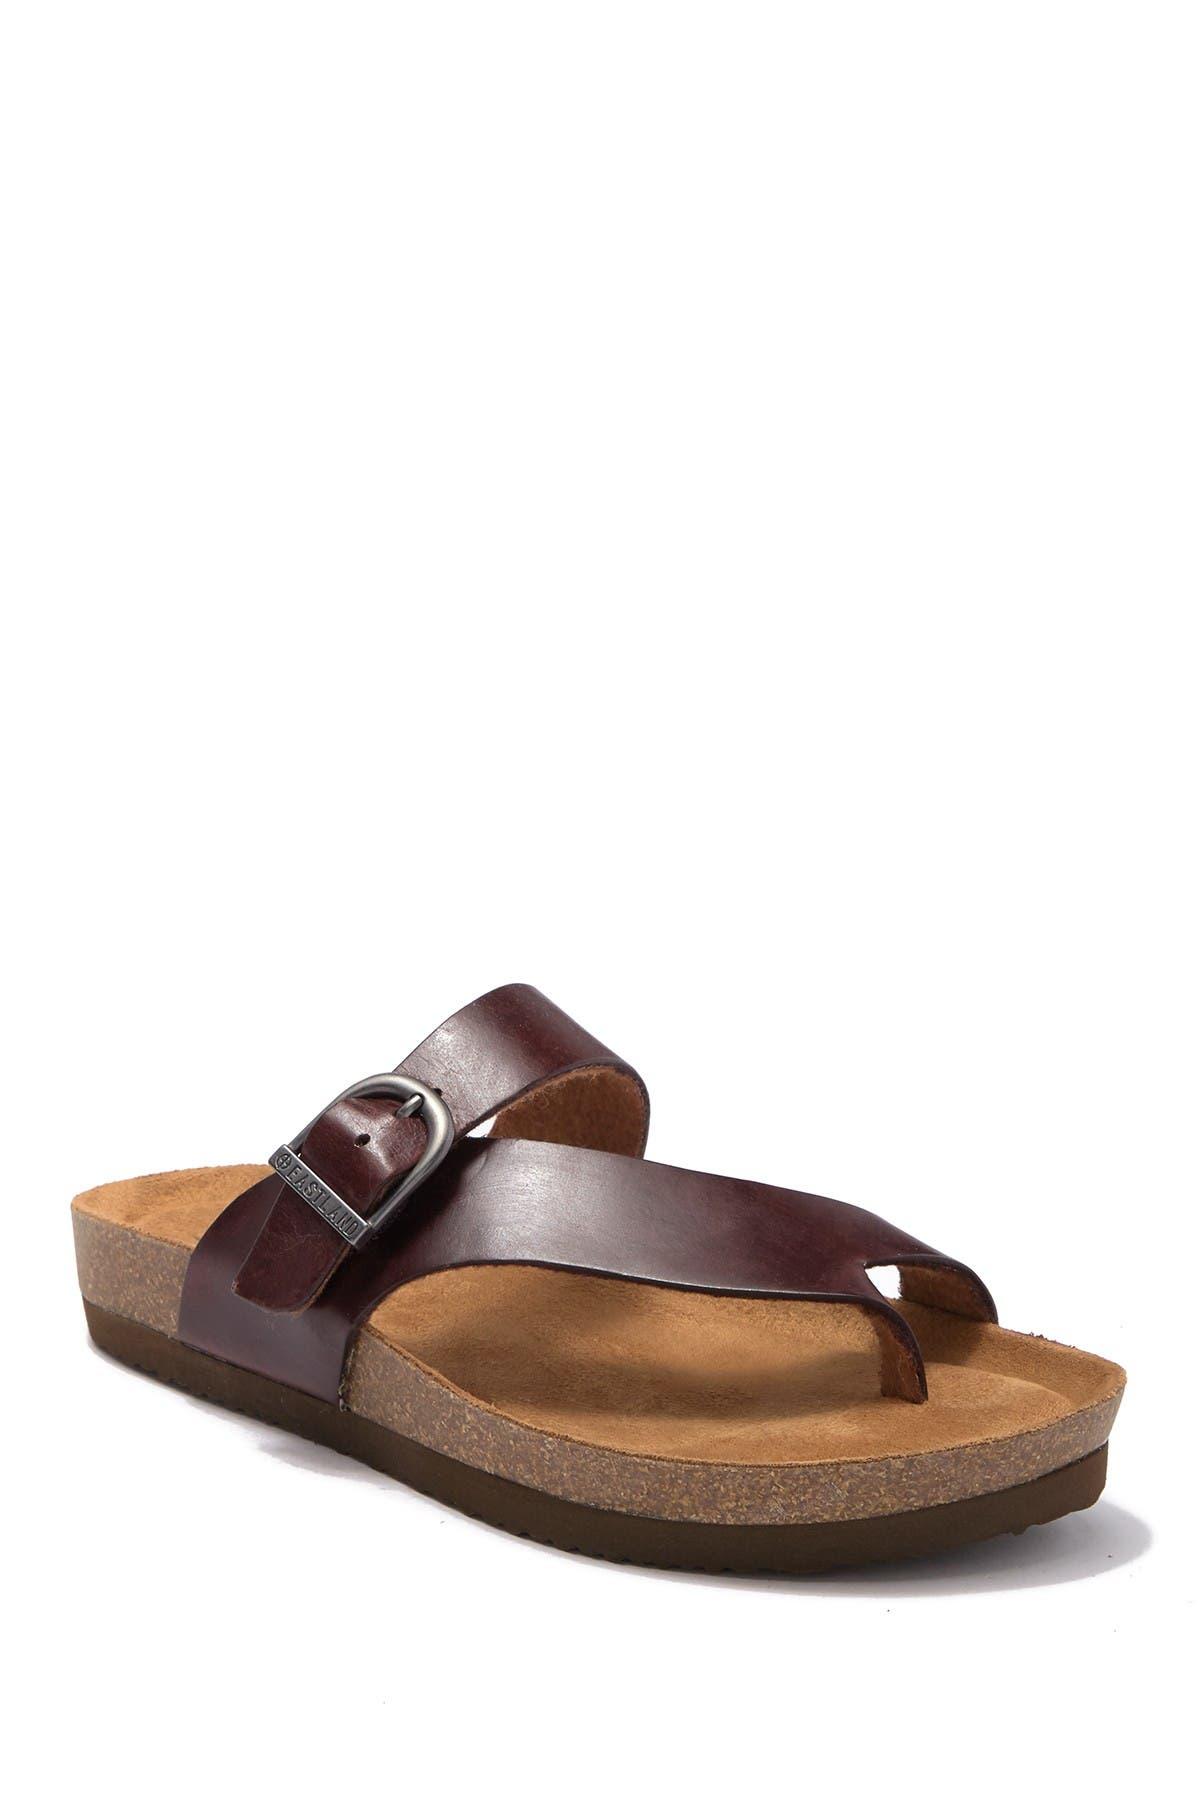 Image of Eastland Shauna Loop Toe Sandal